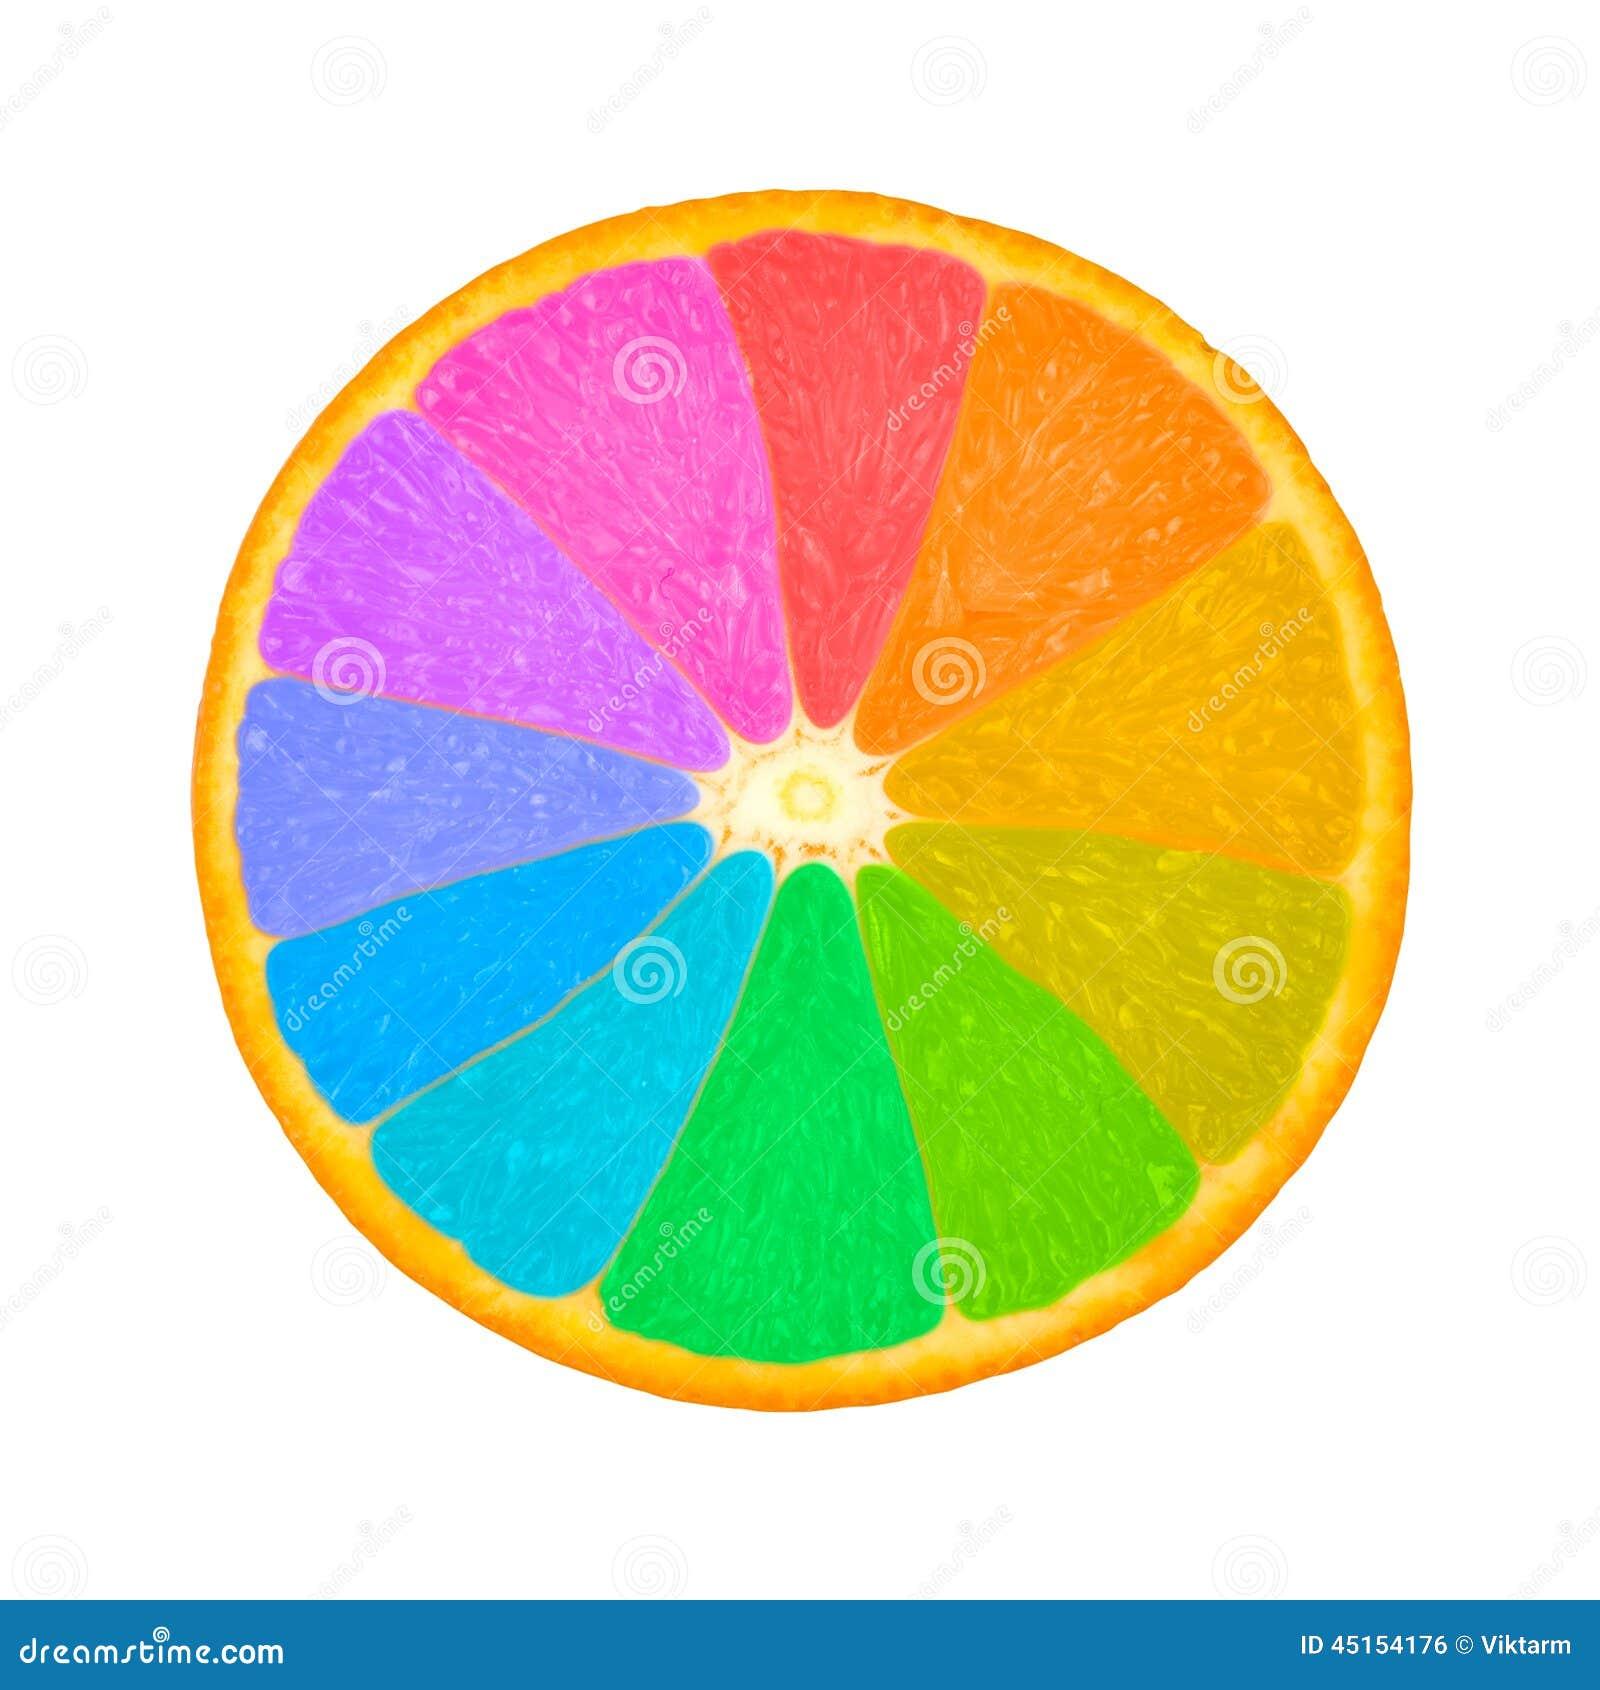 Oranje plak als kleurenwiel